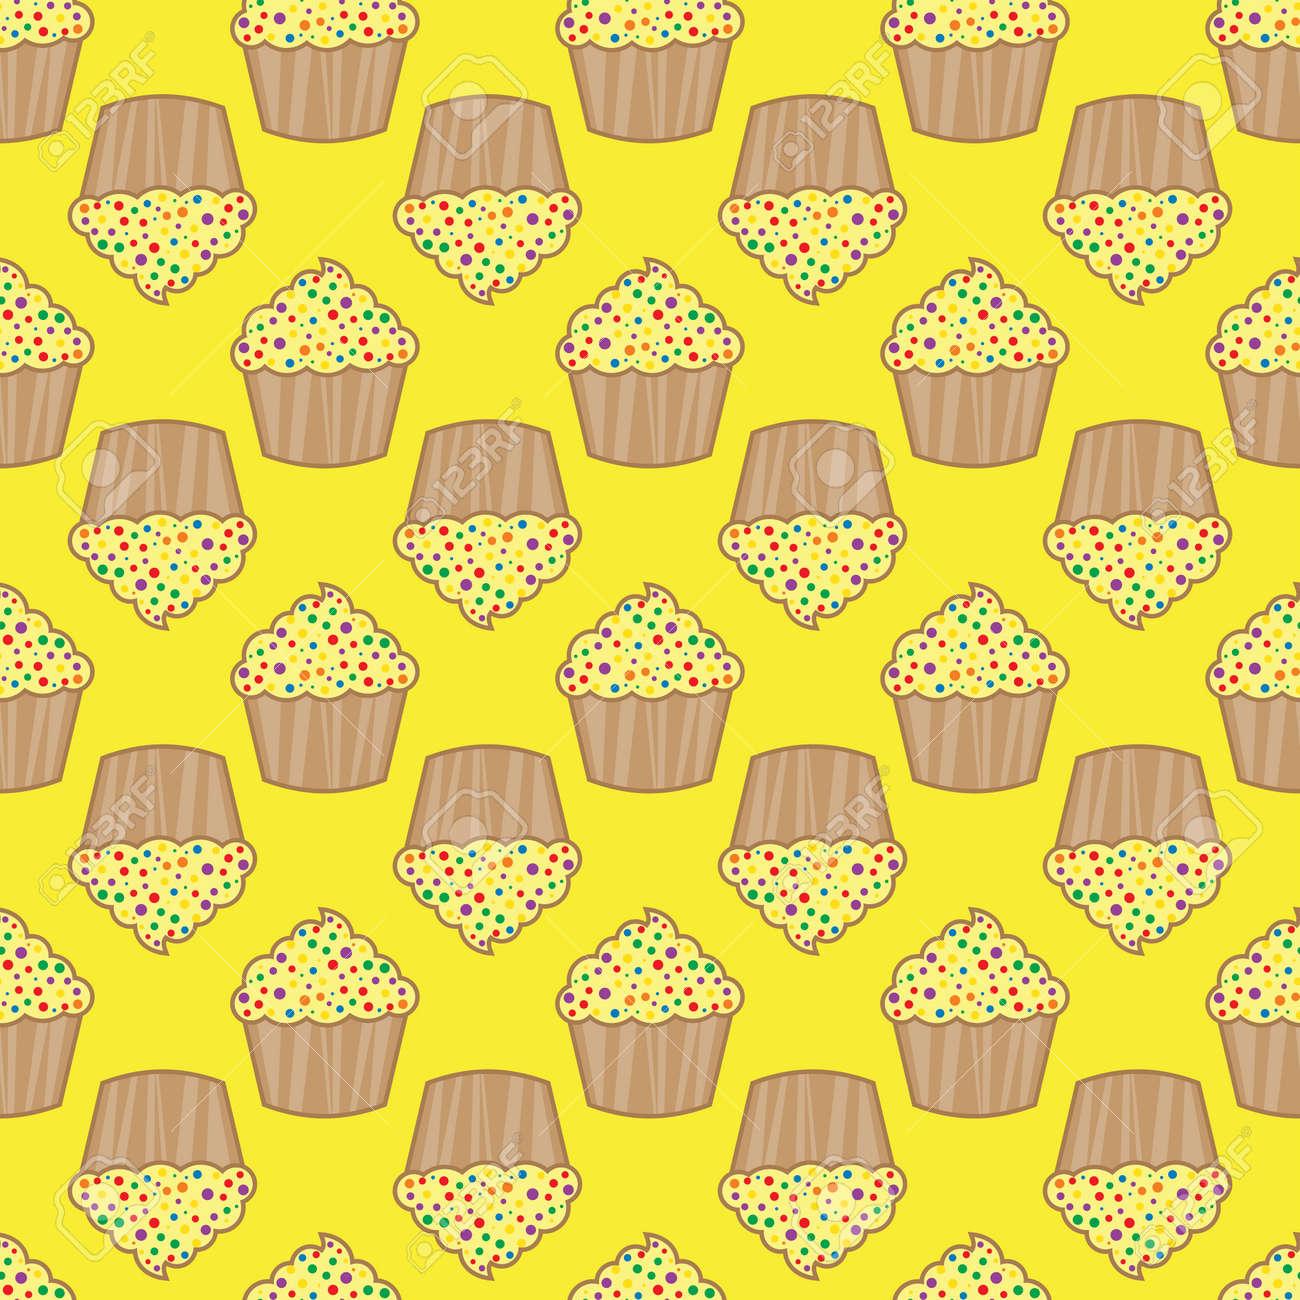 Orange lemon cream cake pattern design template. Stock Vector - 88138745